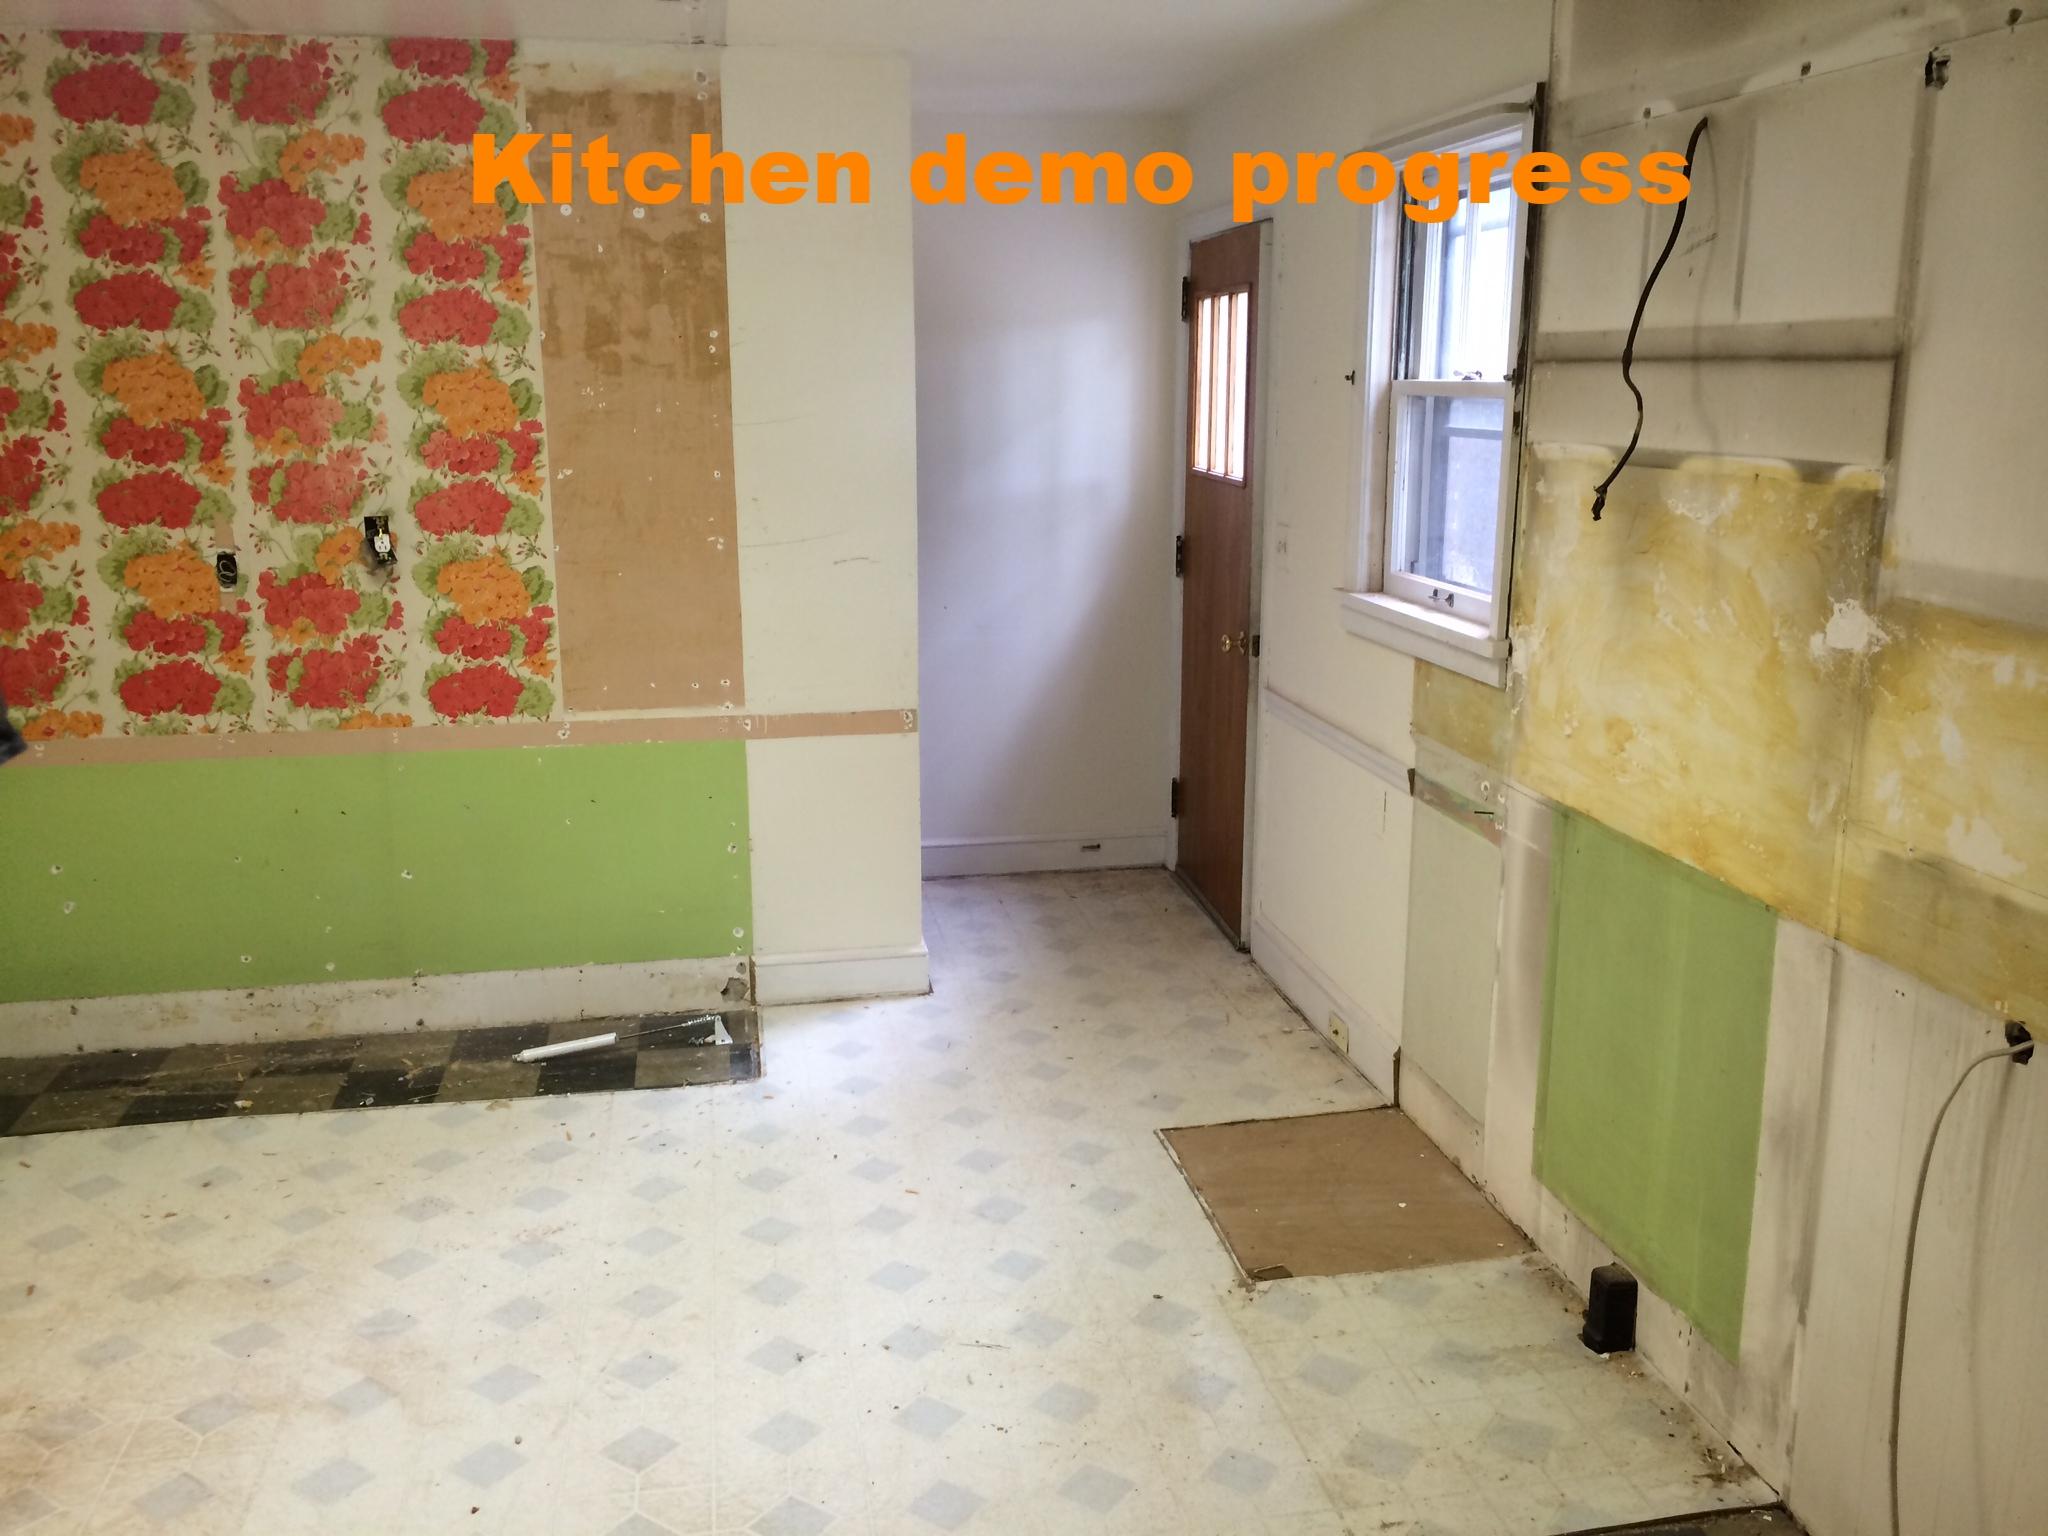 Kitchen demo progress_1.JPG